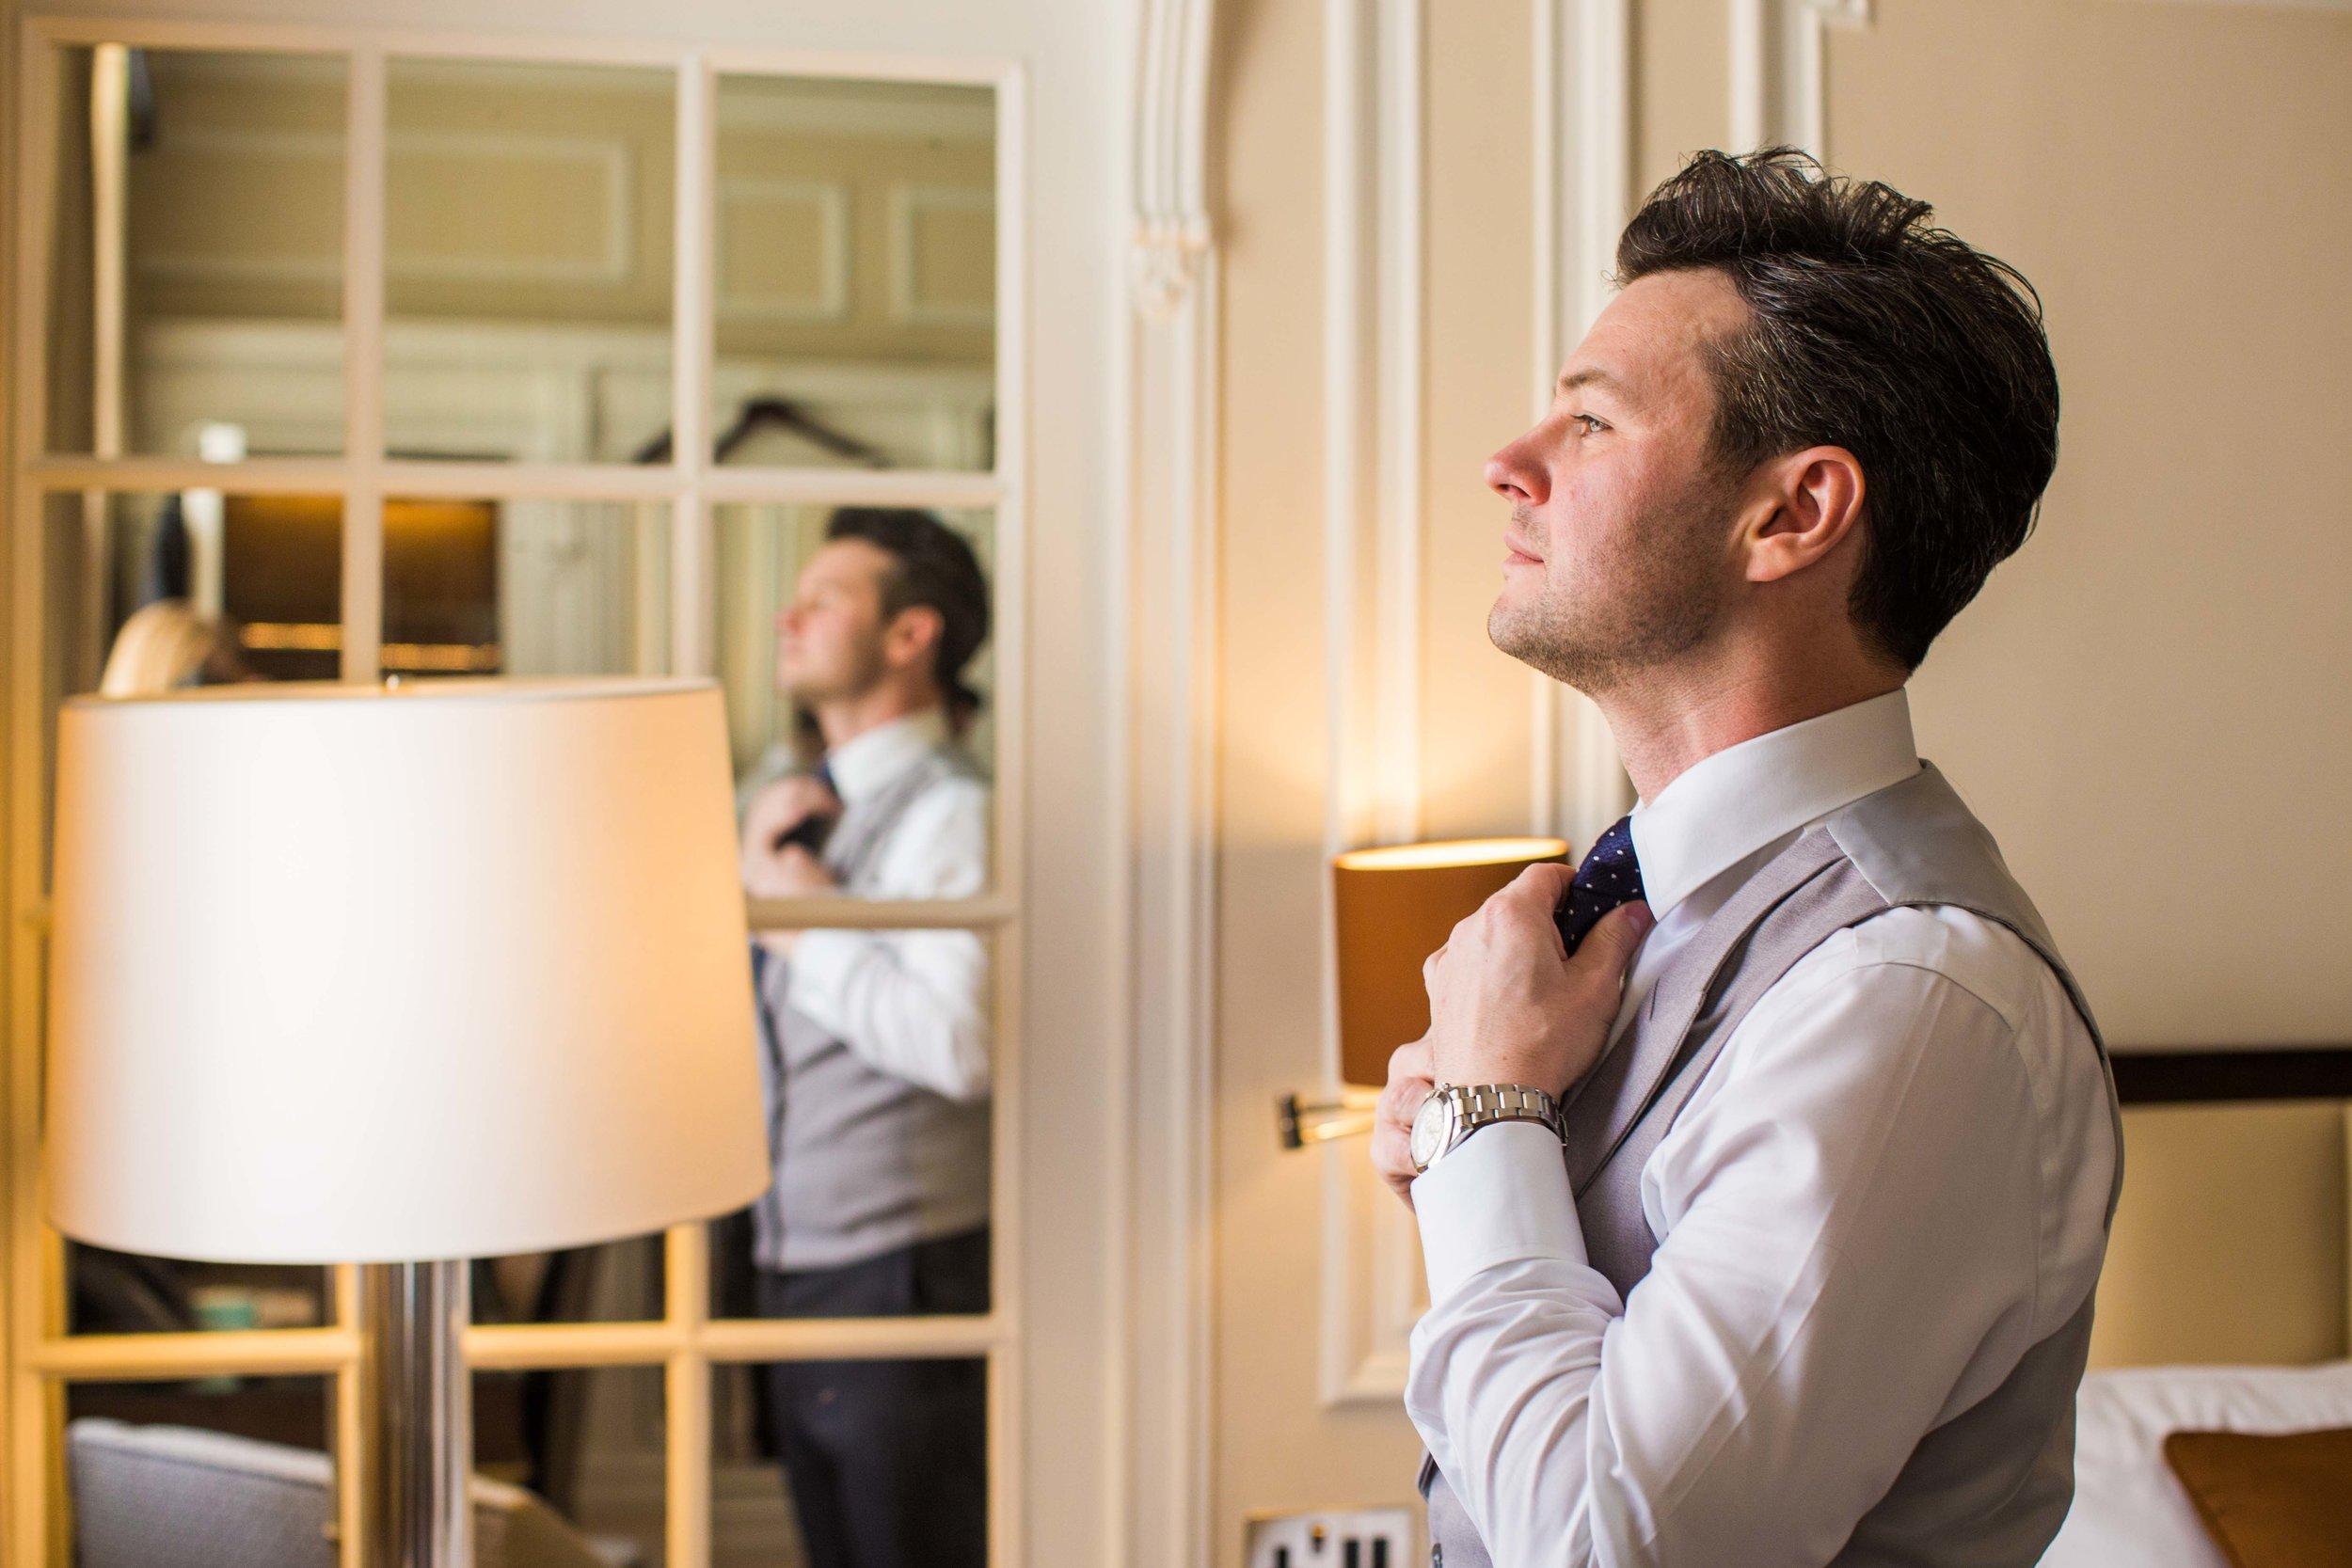 claridges-hotel-wedding-photographer-london-mayfair-natalia-smith-photography-30.jpg